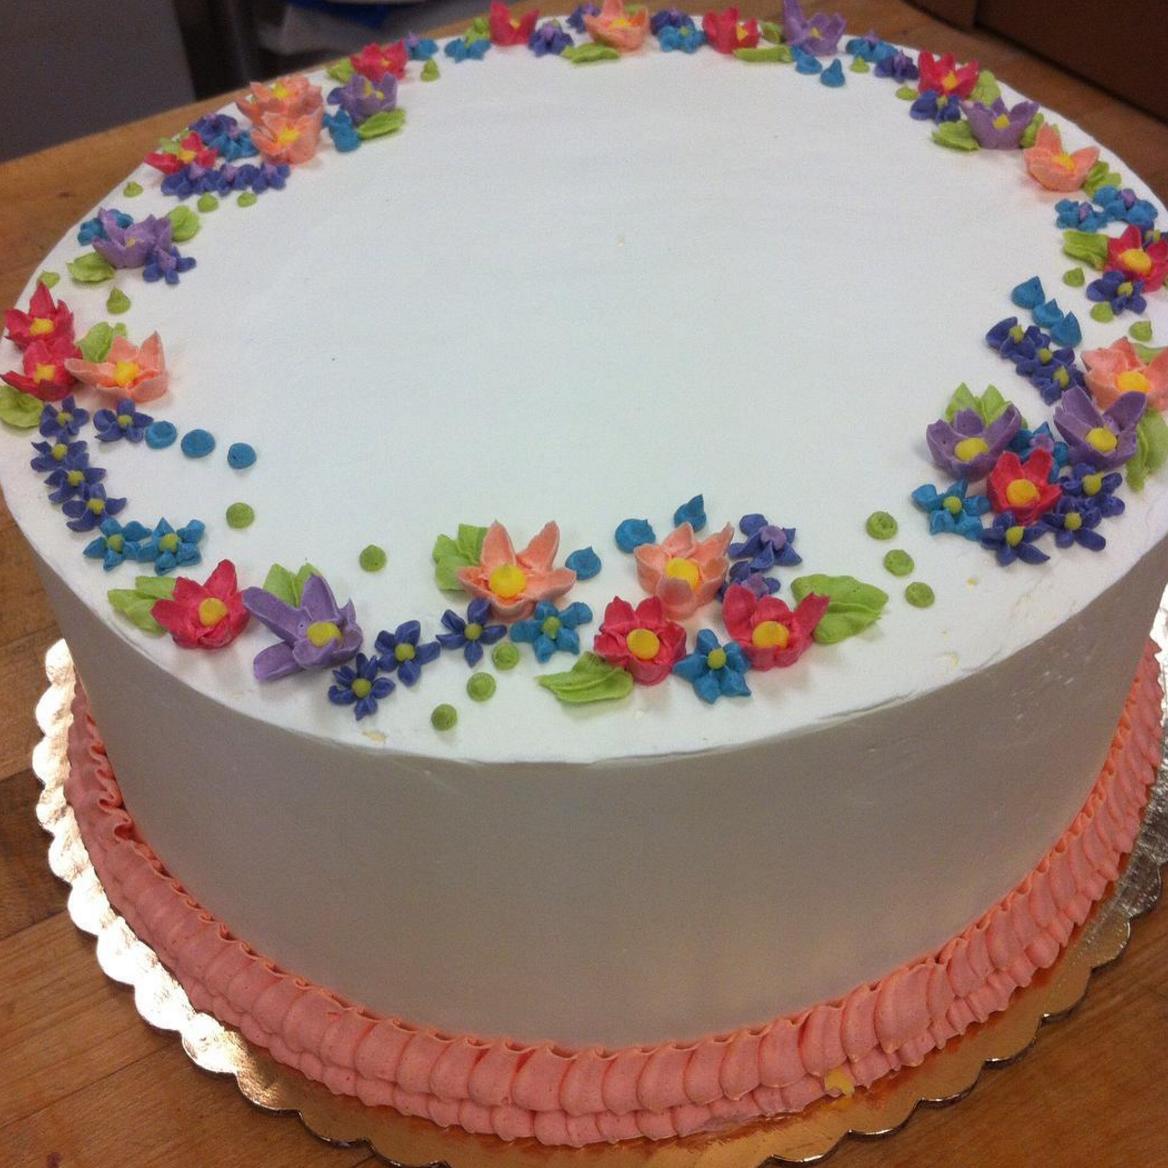 Best Chocolate Cake In Westchester